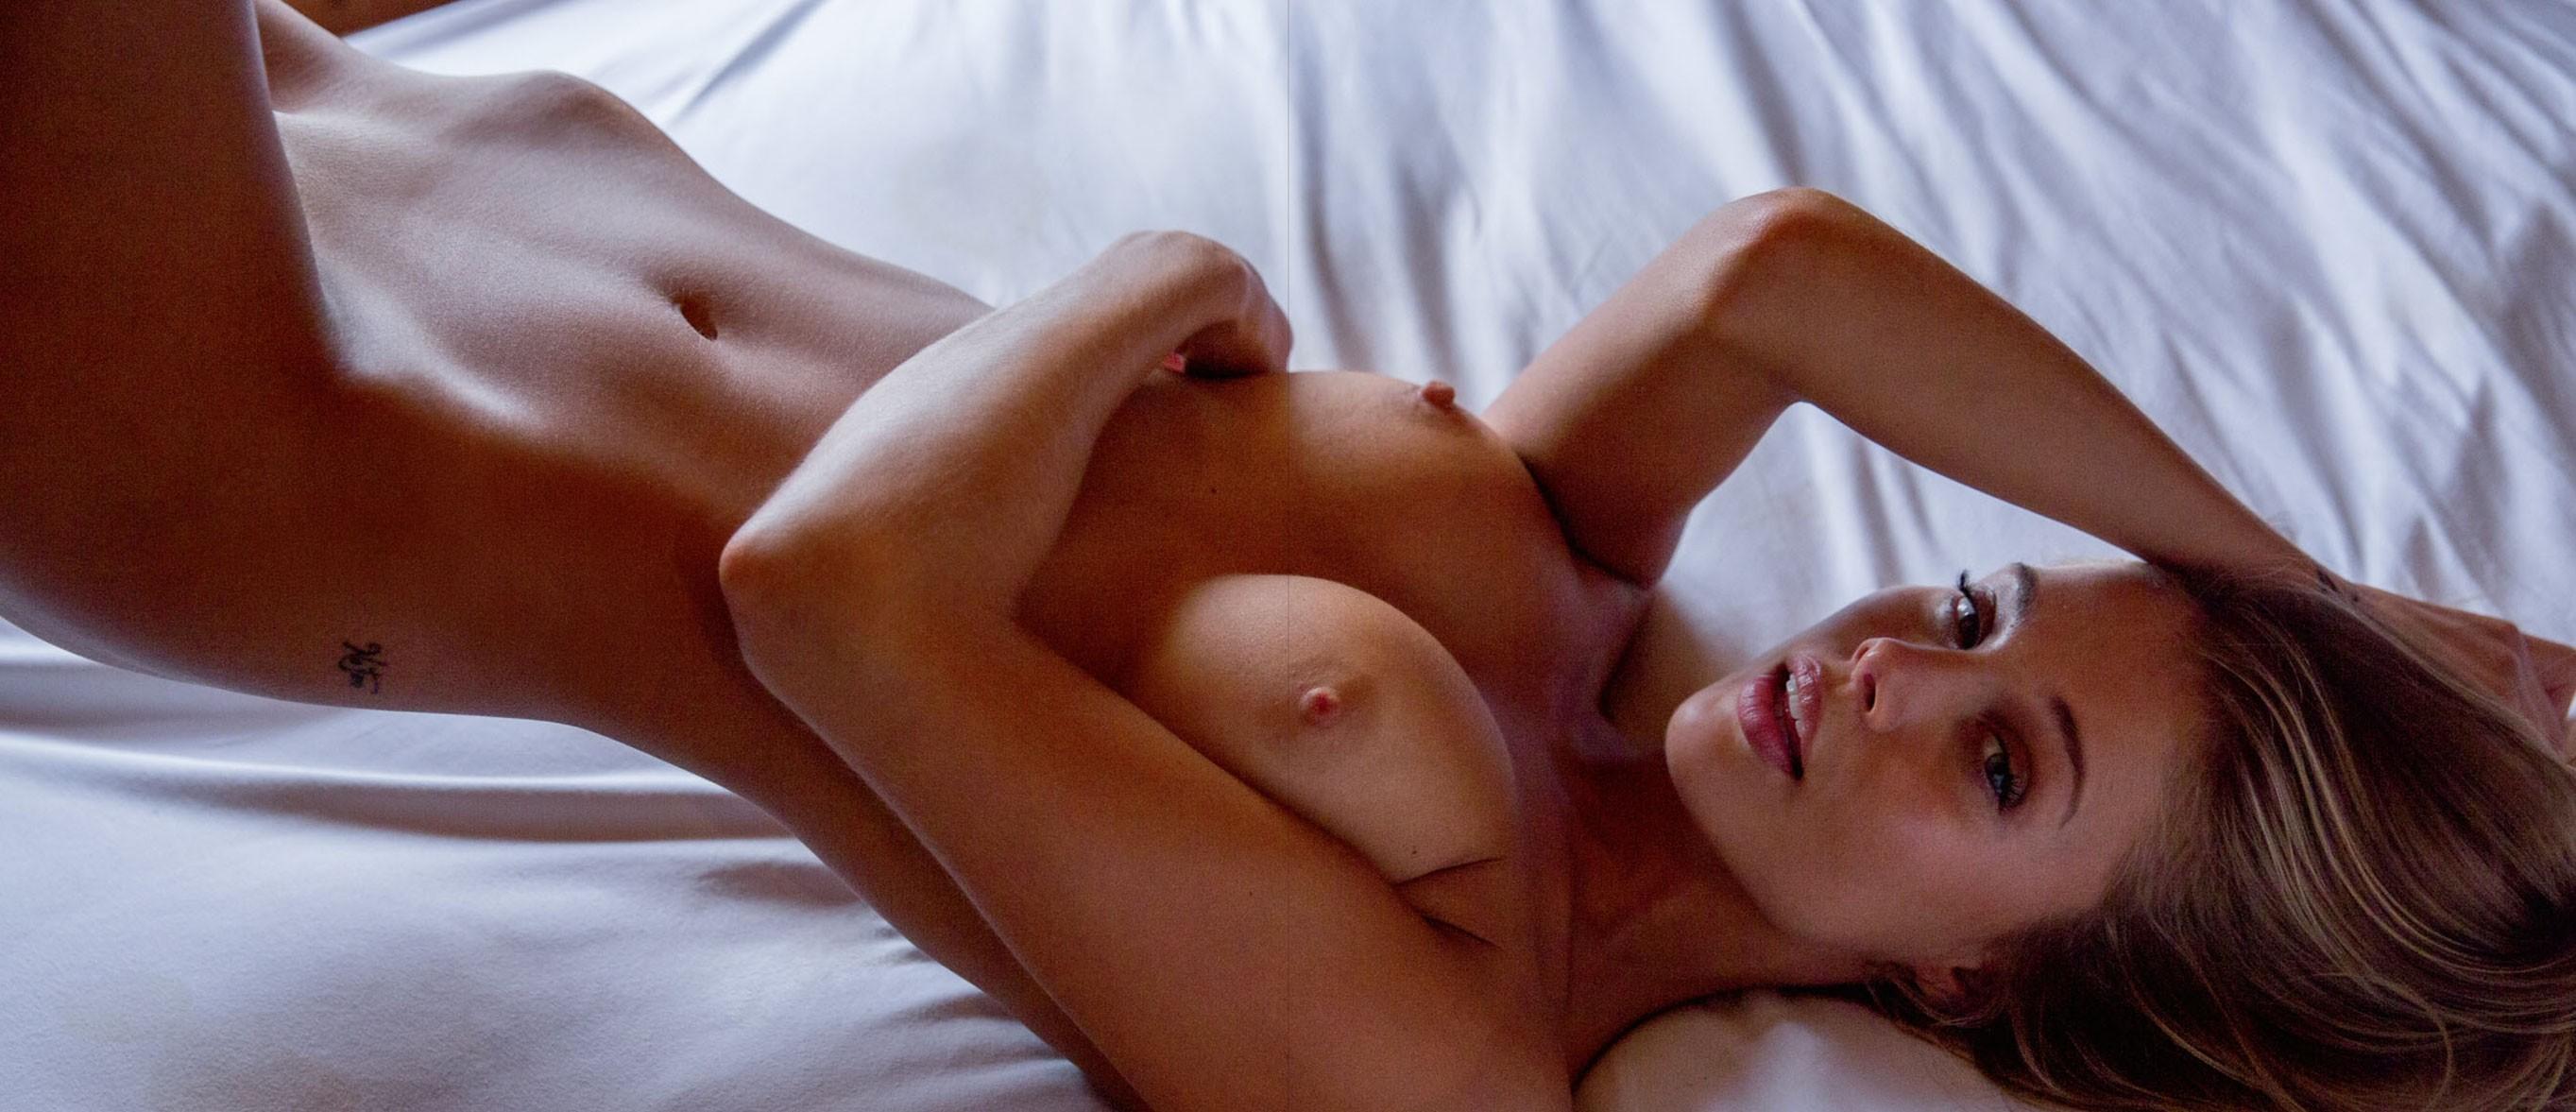 Allie Leggett - Playboy US 2017 december Playmate